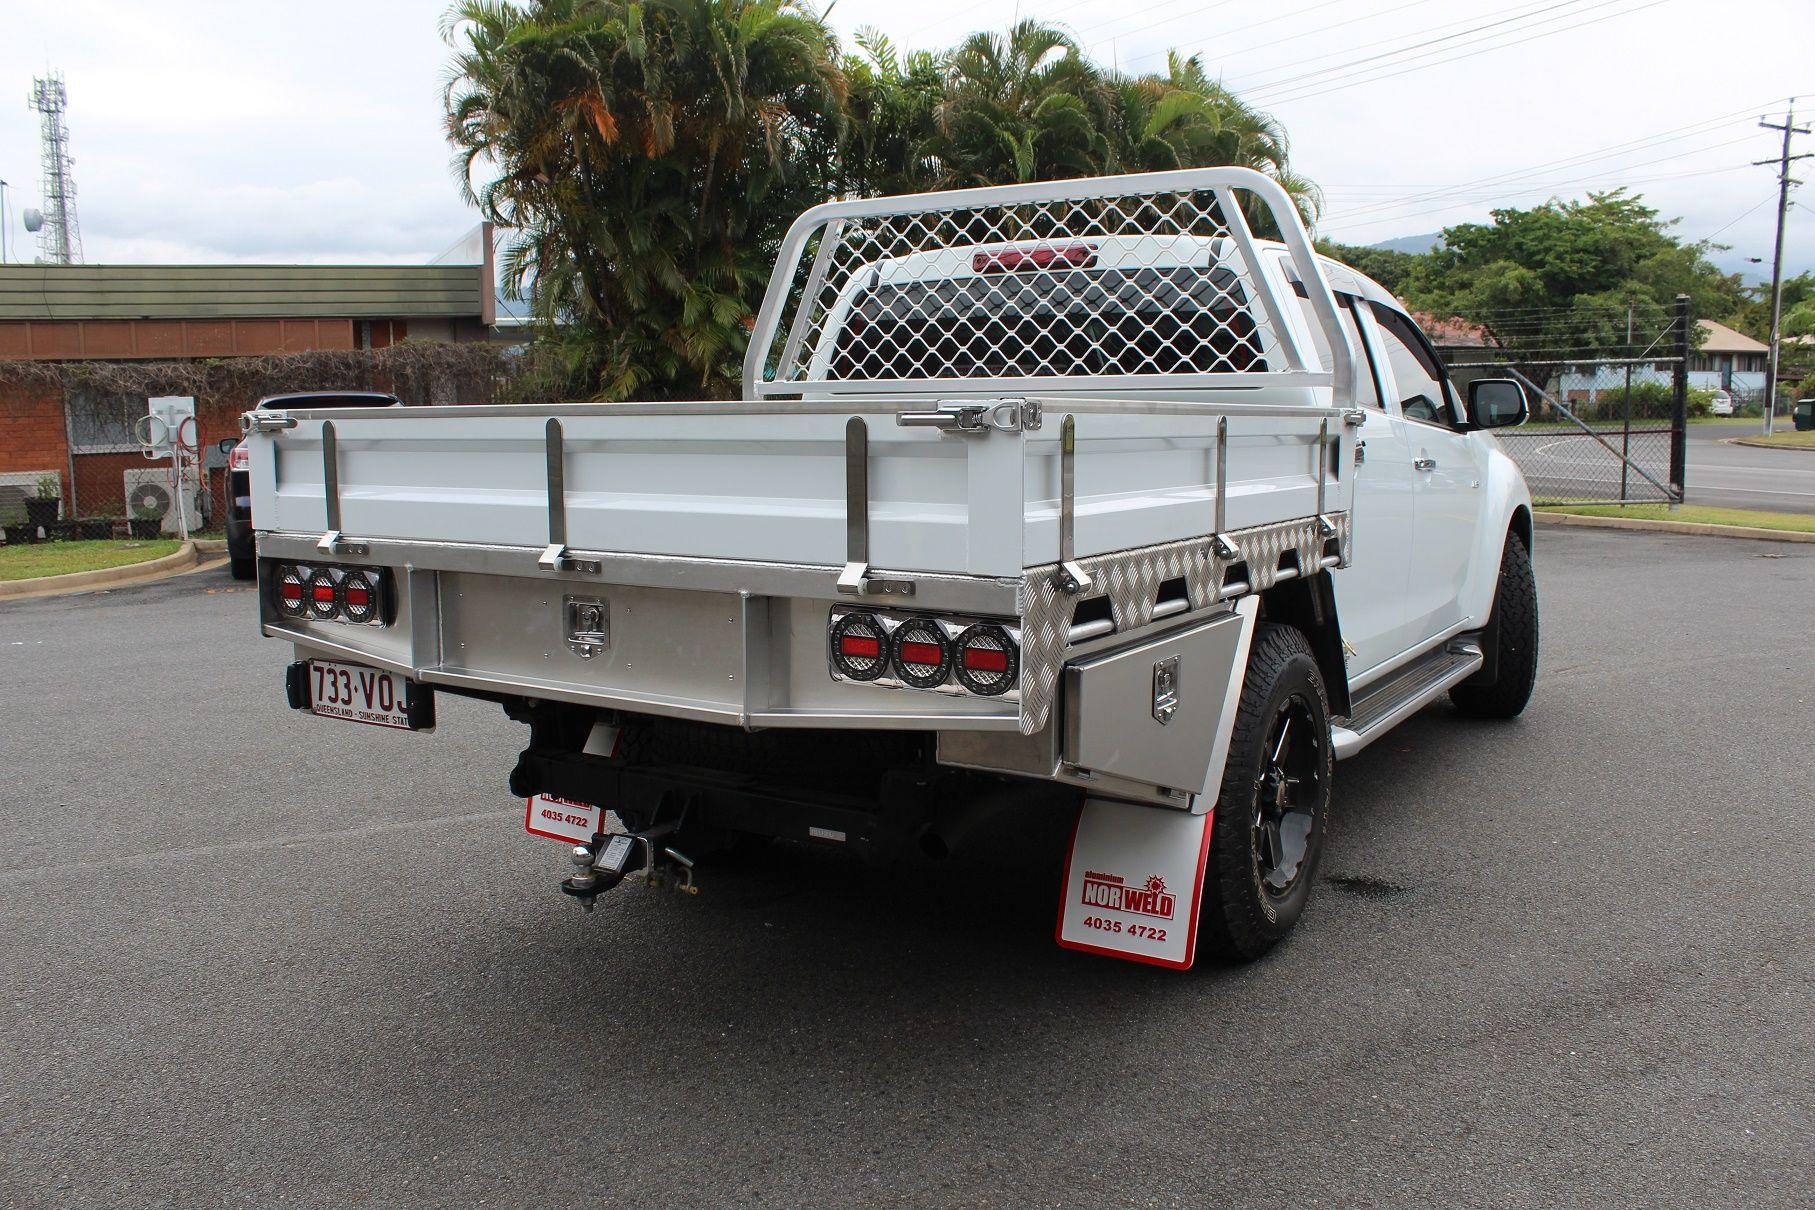 Aftermarket truck bed for isuzu dmax buscar con google pickopoex pinterest truck bed